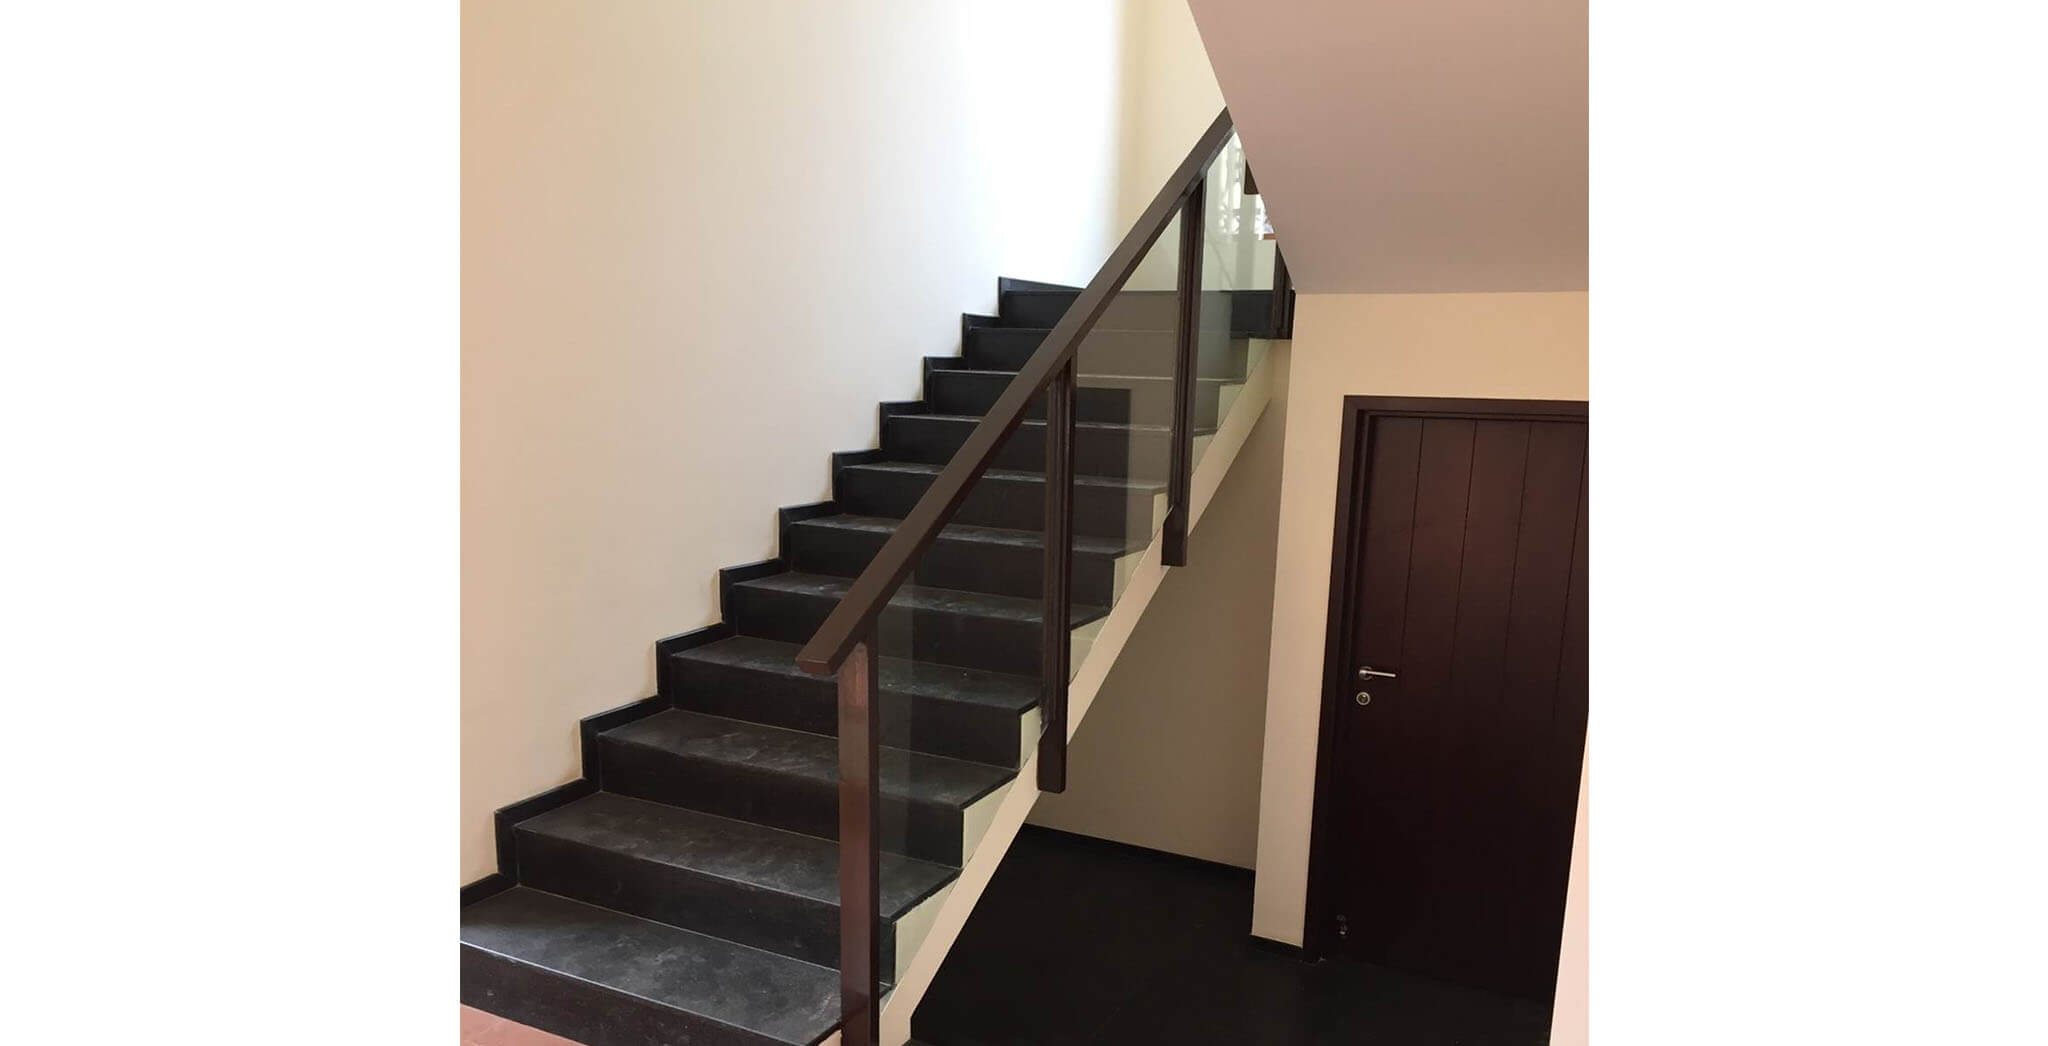 Apr 2019 - Villas: Staircase railing work-in-progress